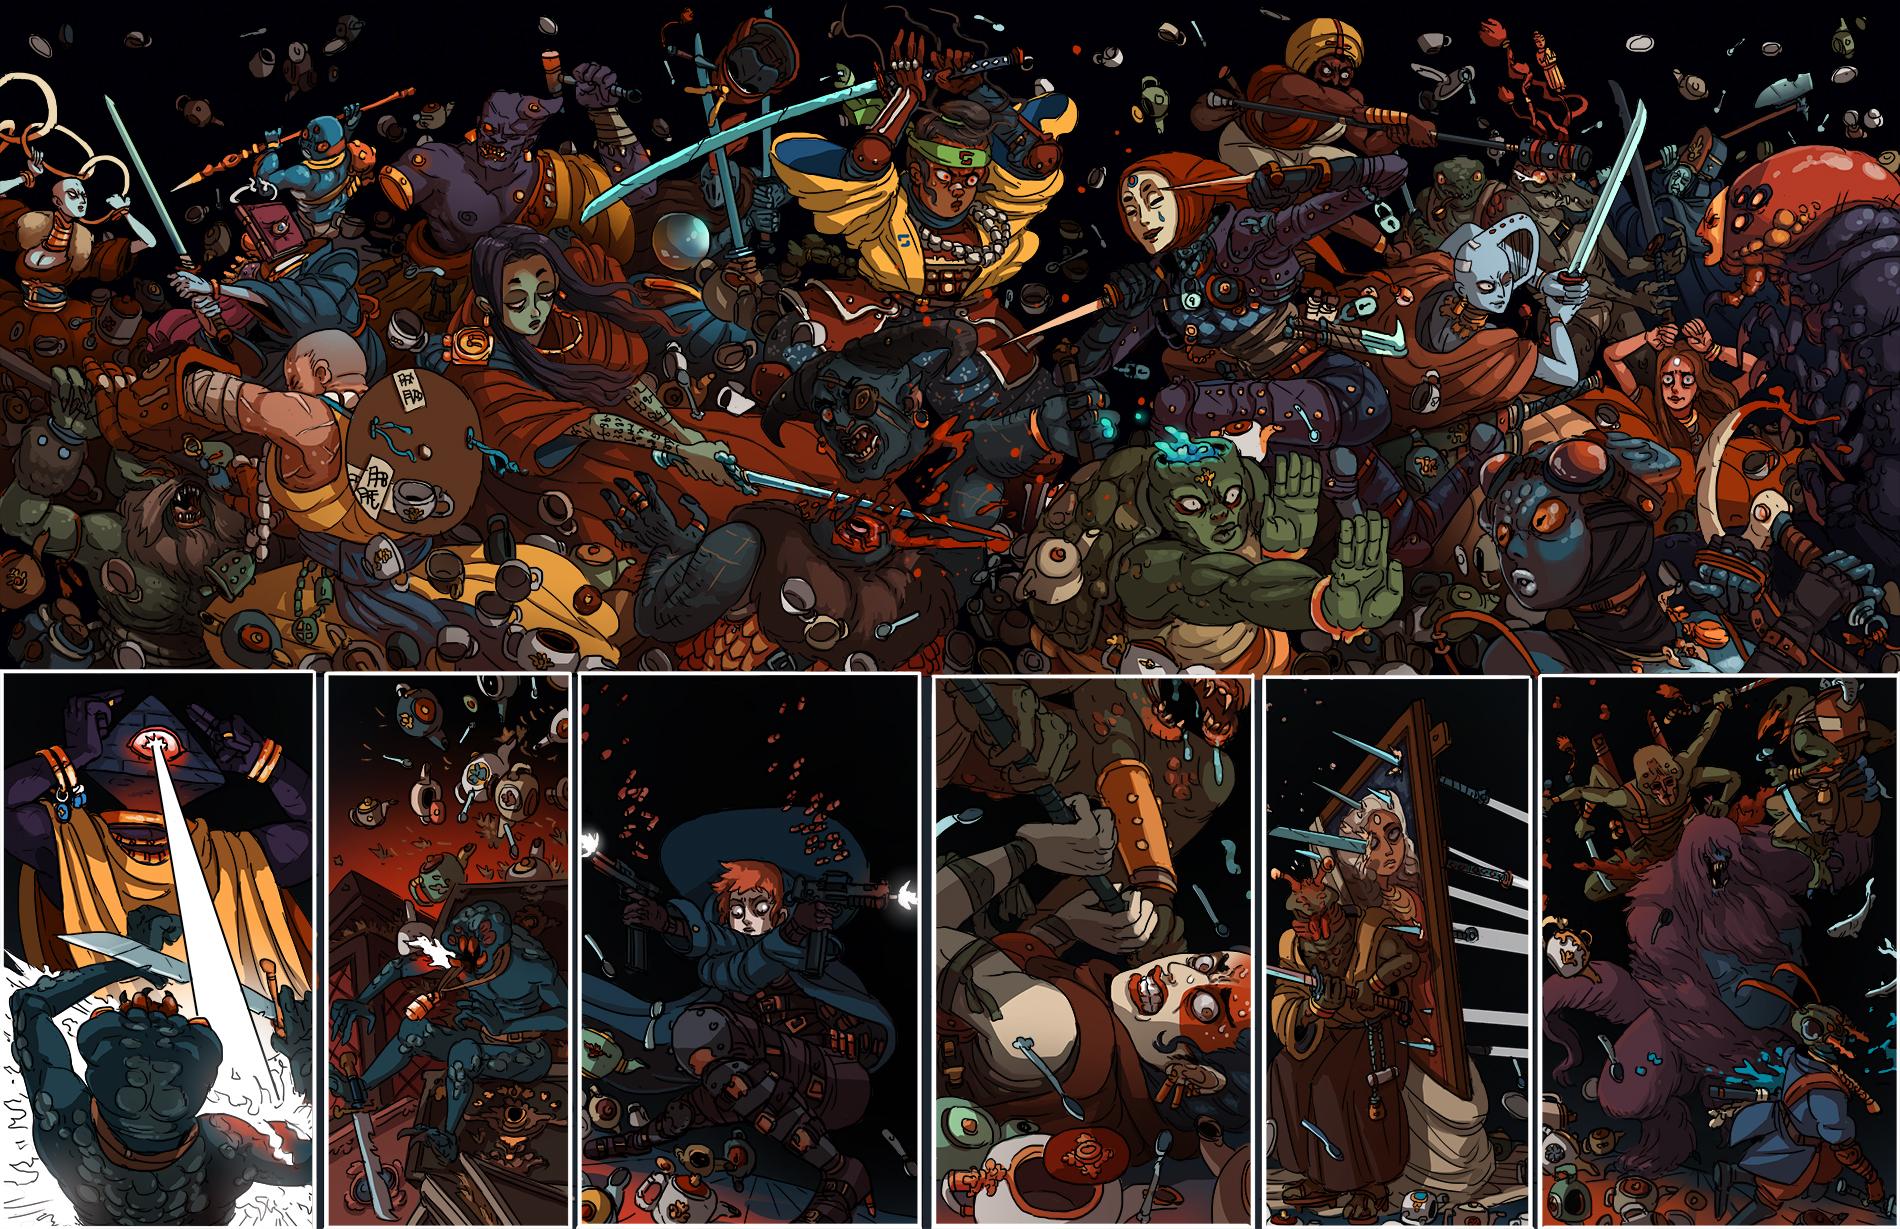 Kill 6 Billion Demons Wieder of Swords review